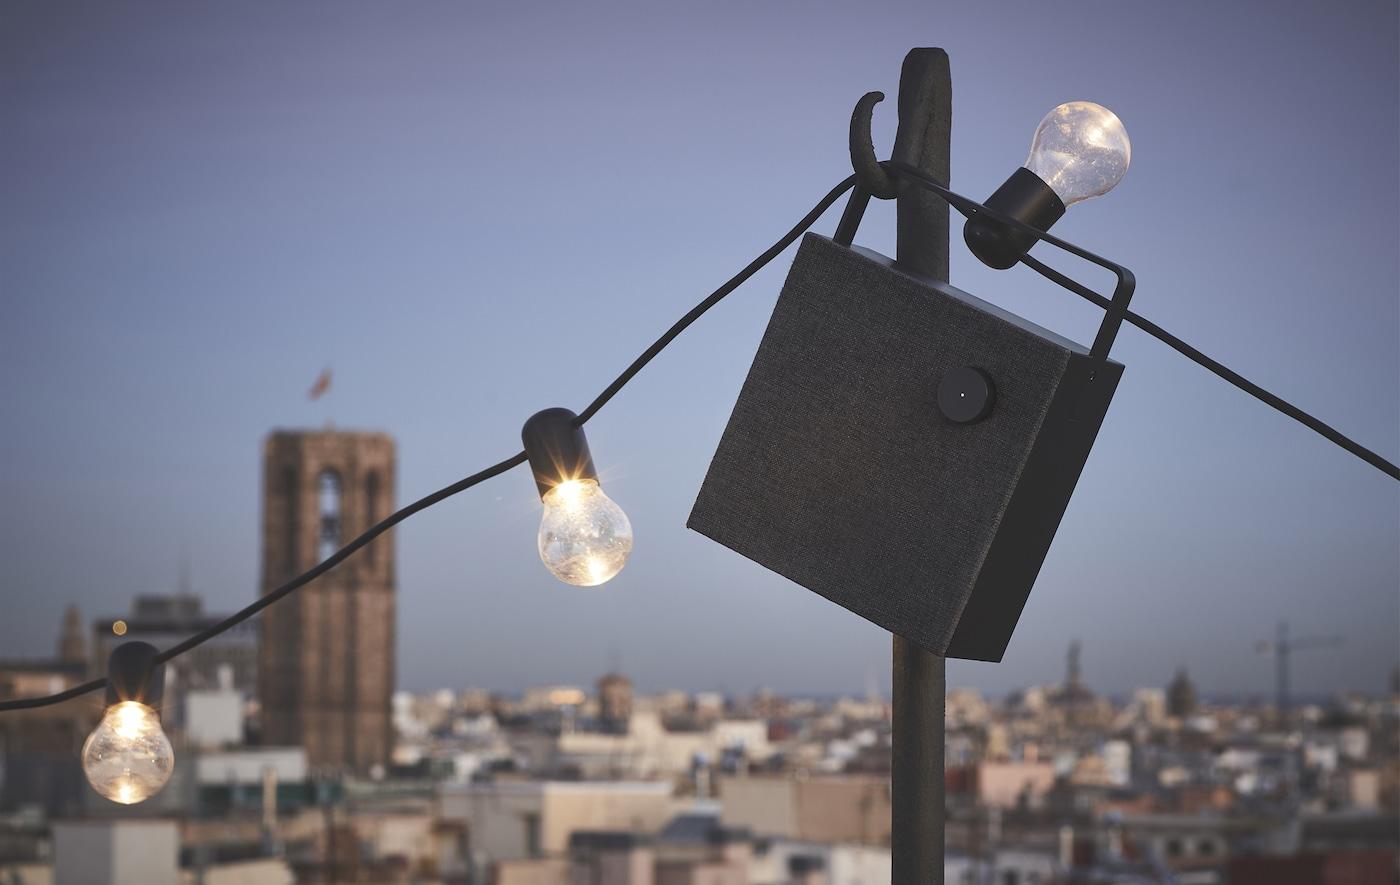 A black speaker and string of lights hanging up outside.